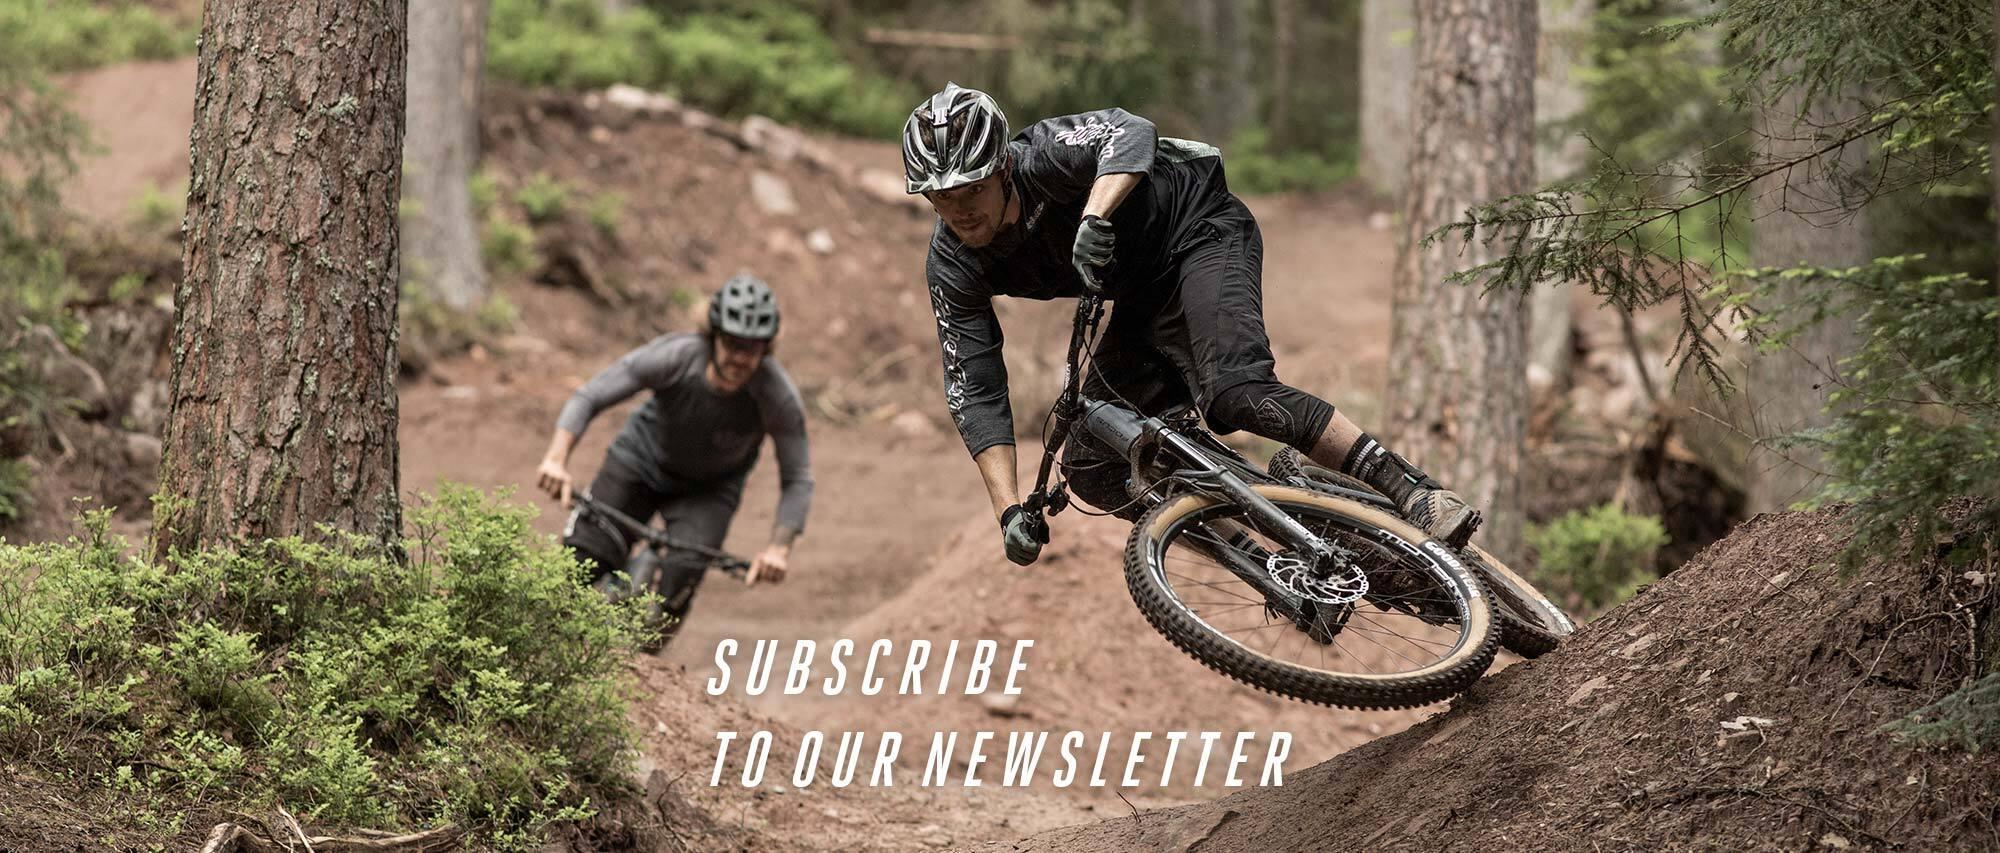 FOCUS Bikes Newsletter Subscribe